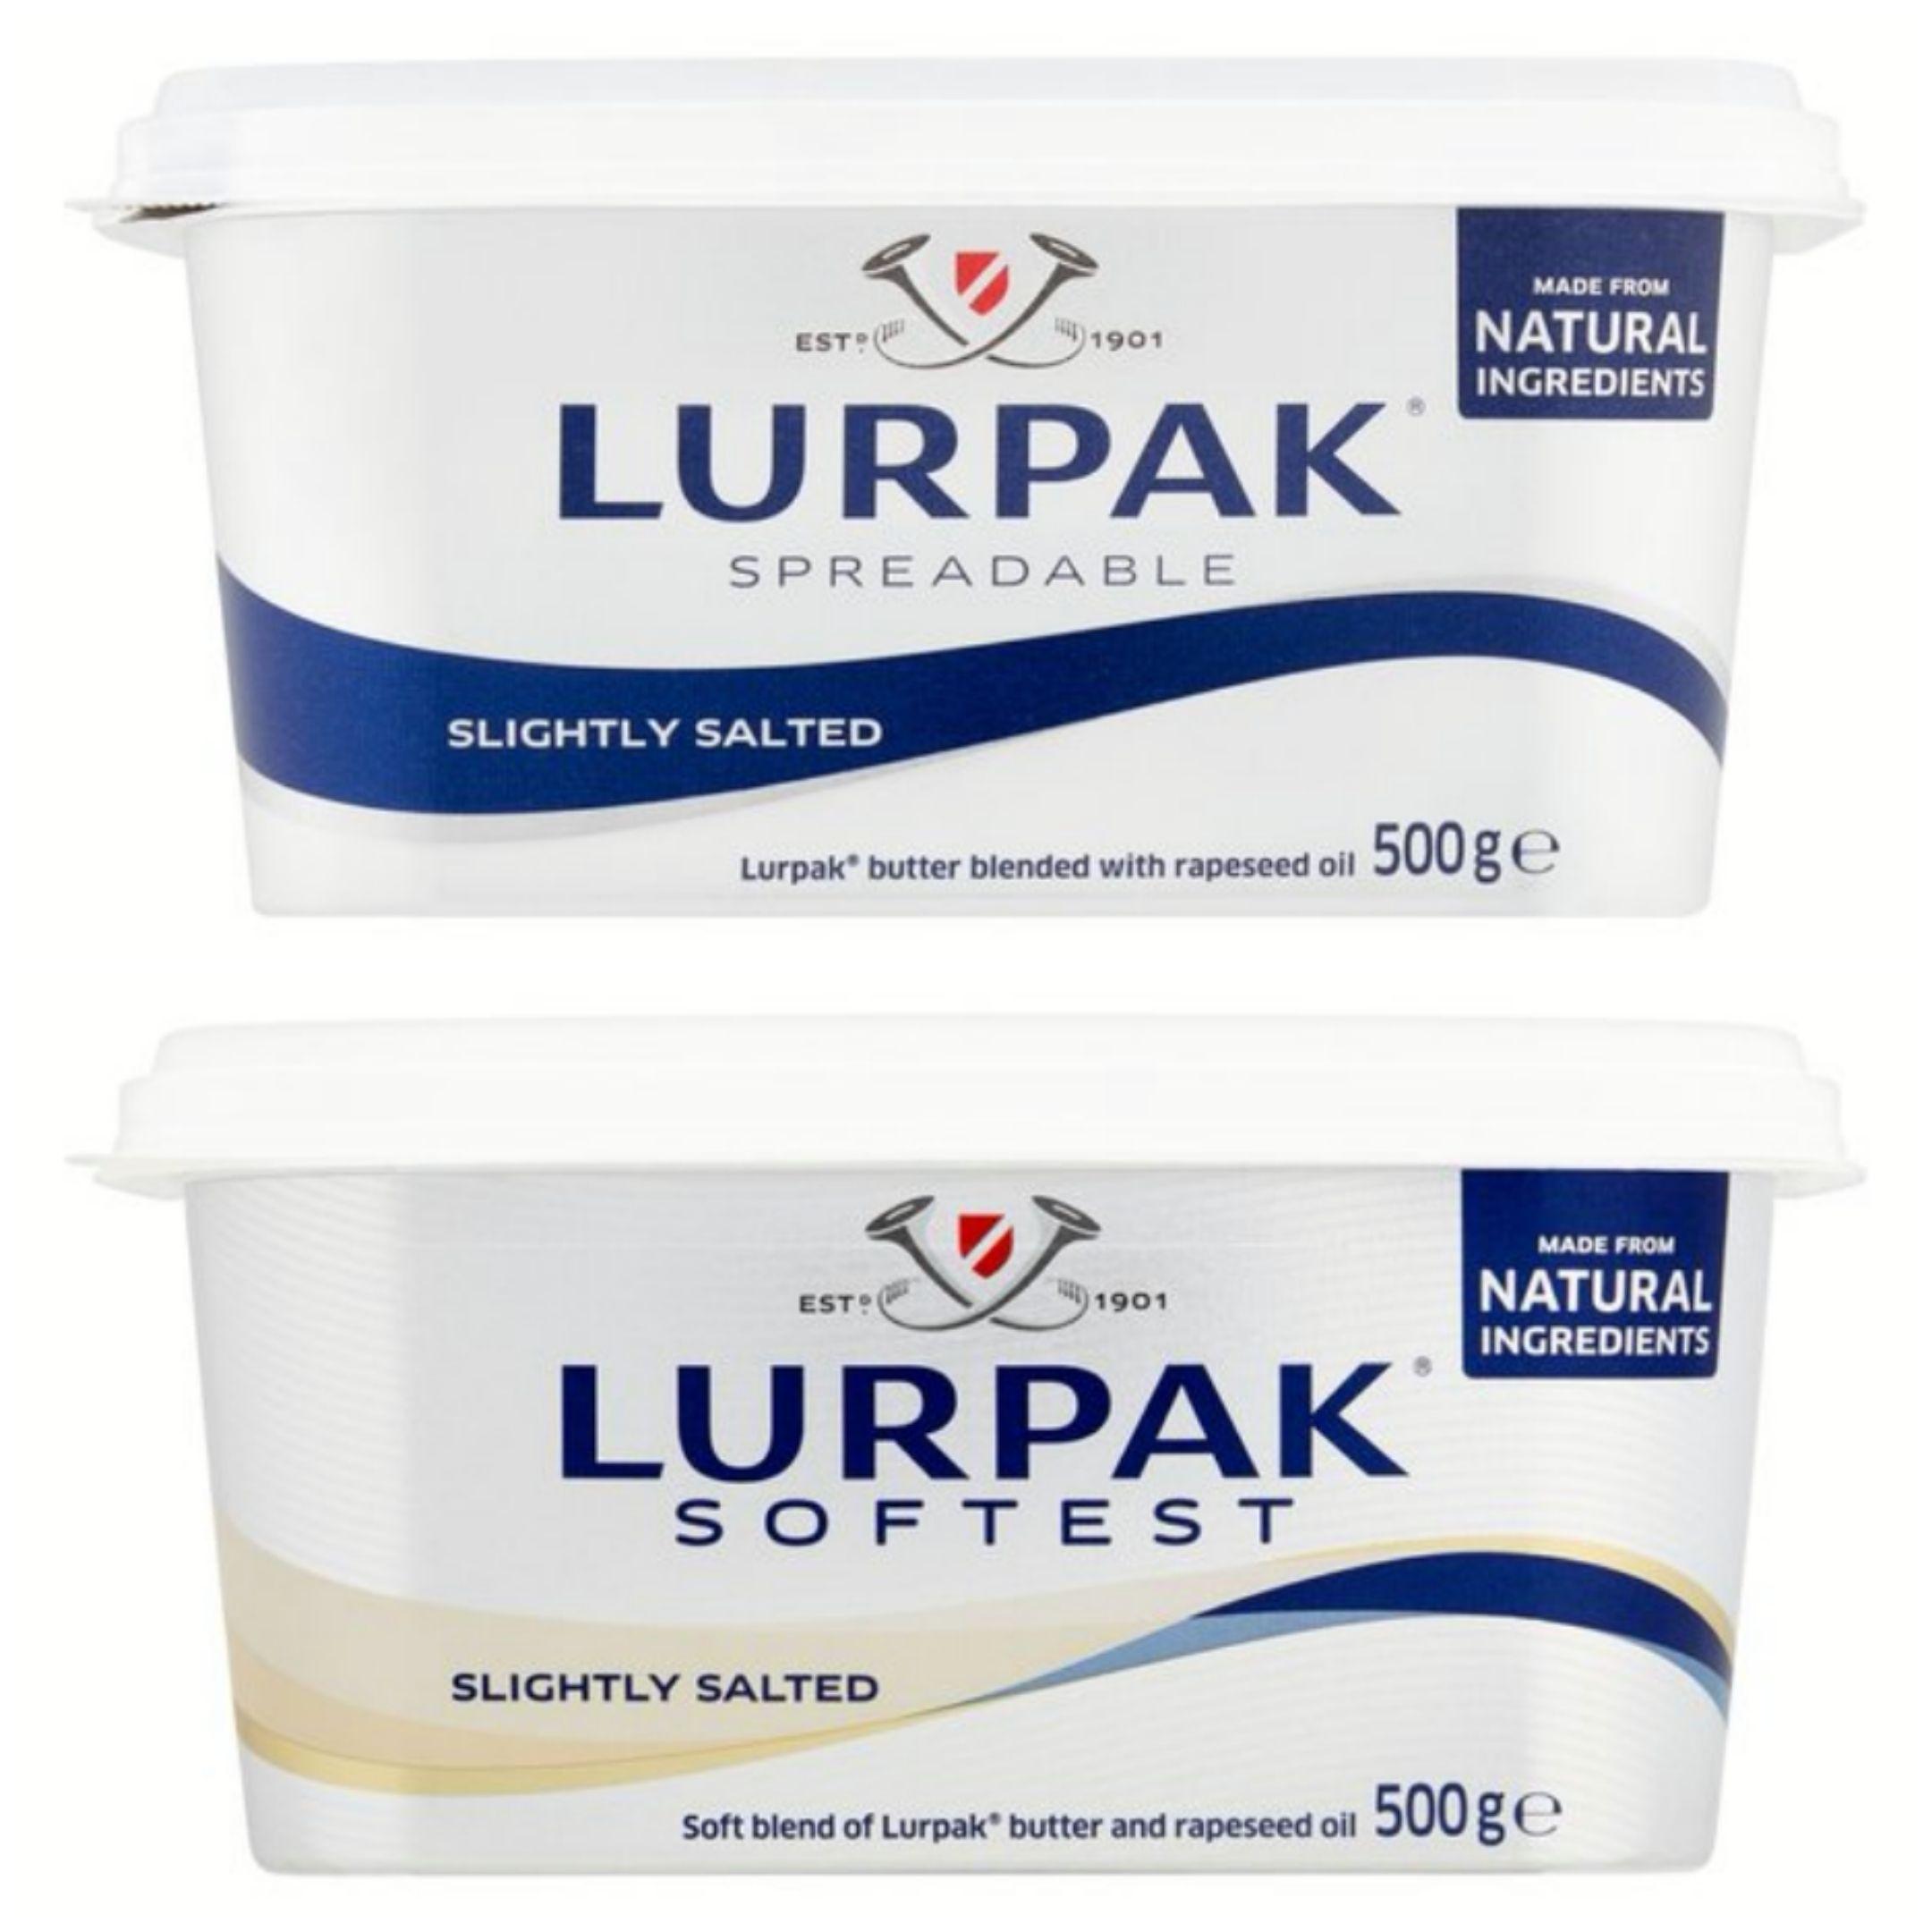 Lurpak Slightly Salted Spreadable / Spreadable Softest 500g £2.75 @ Morrisons